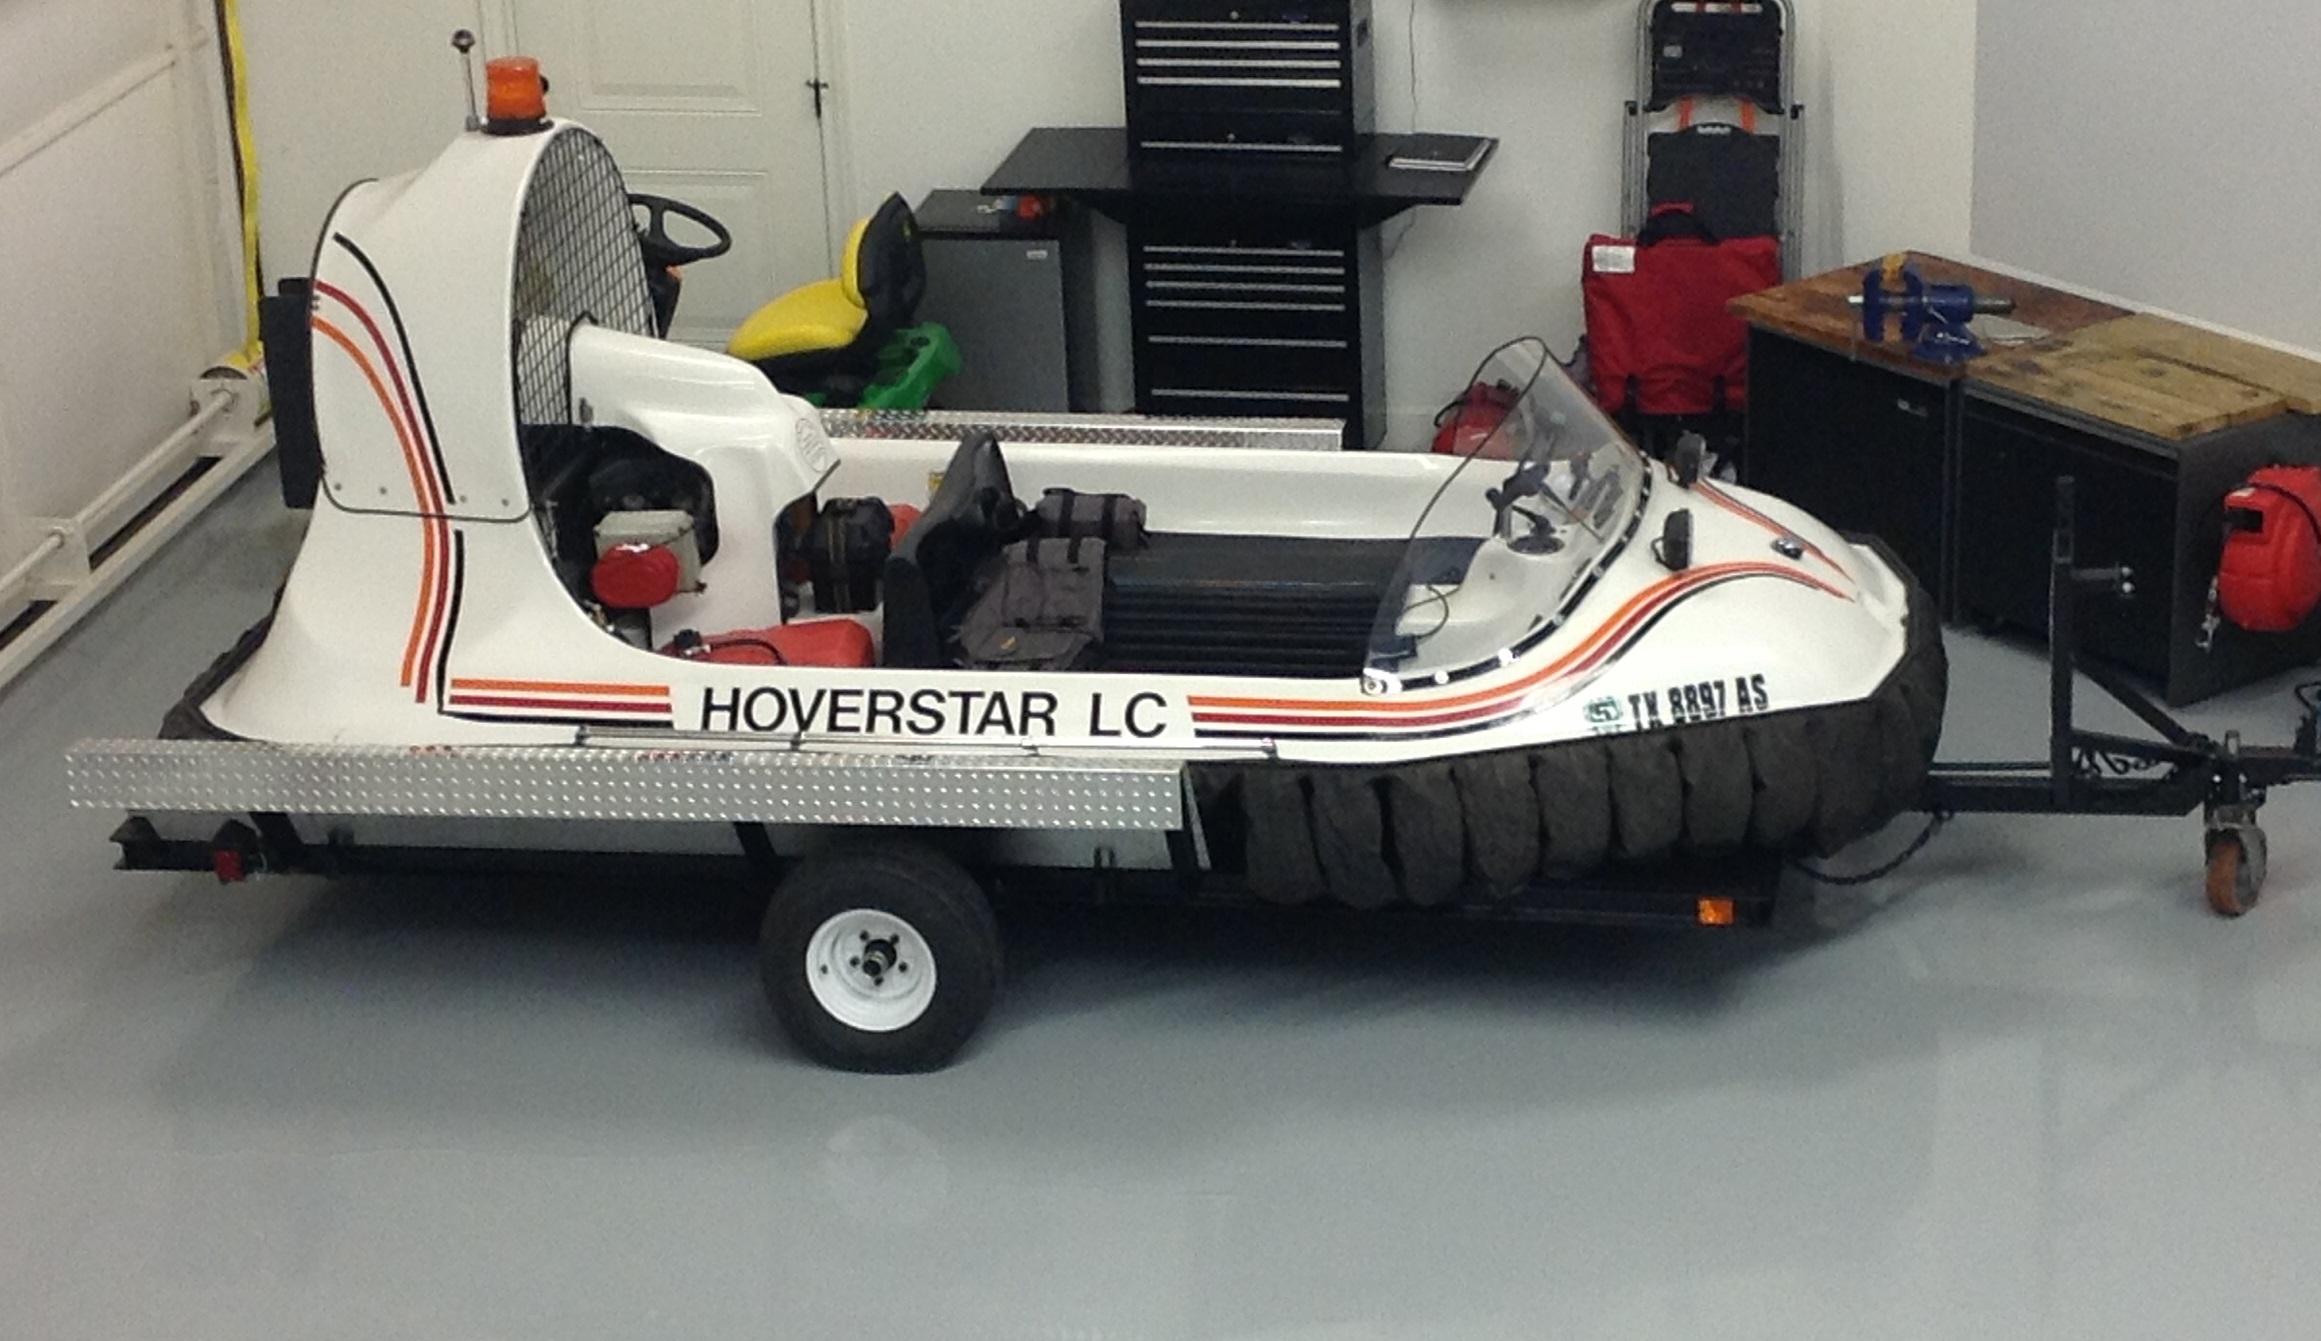 Hovertechnics Hoverstar LC Hovercraft